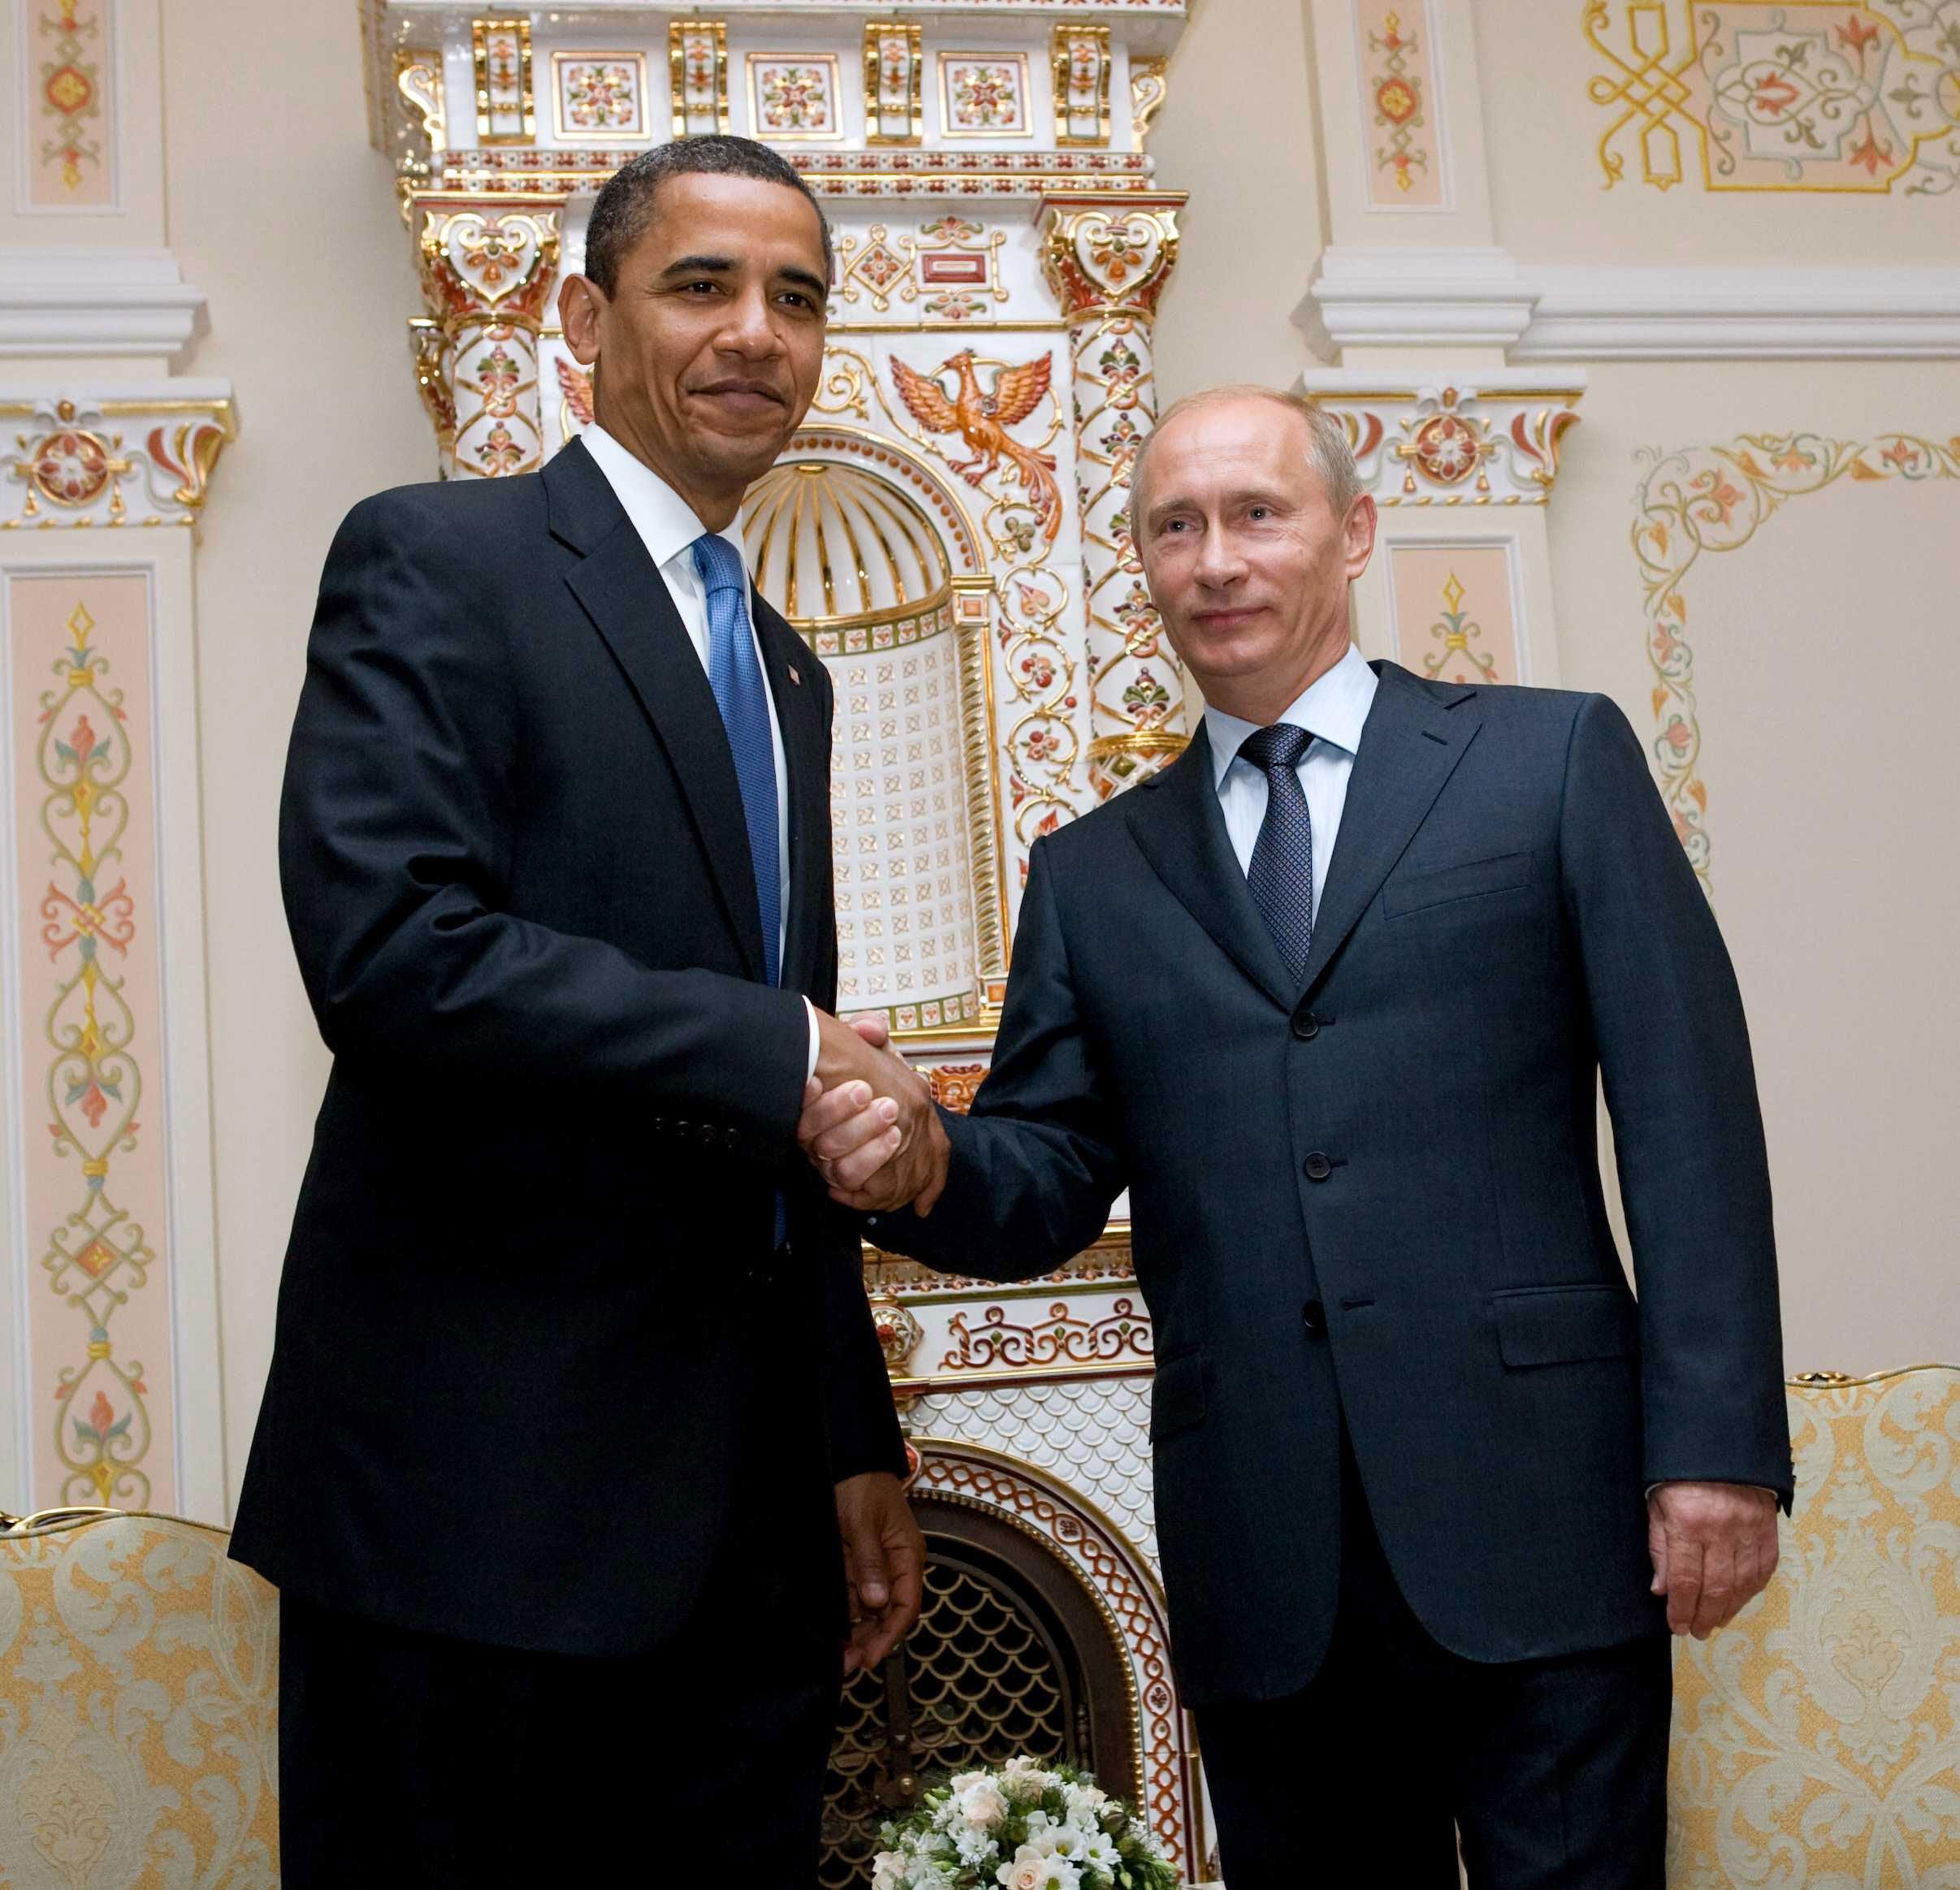 President Barack Obama and Russian Prime Minister Vladimir Putin